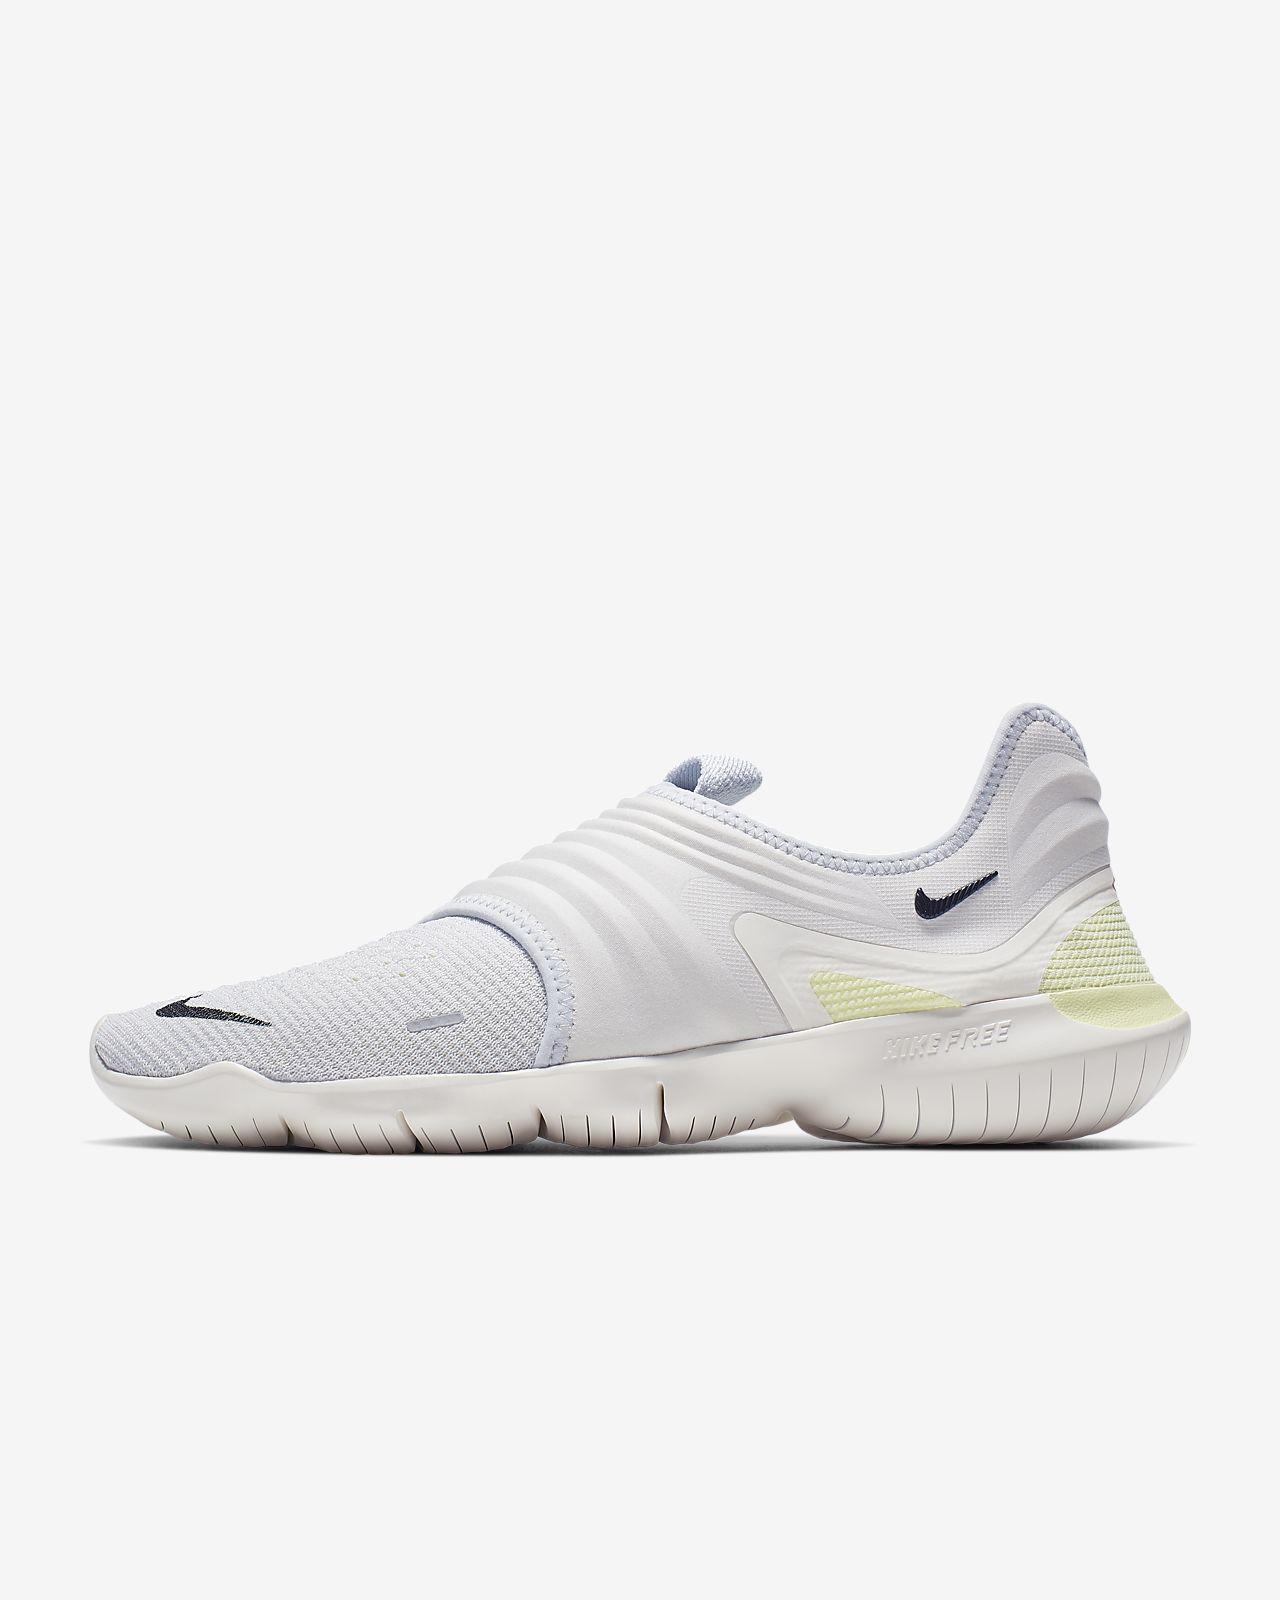 337124392ad2 Scarpa da running Nike Free RN Flyknit 3.0 - Uomo. Nike.com IT